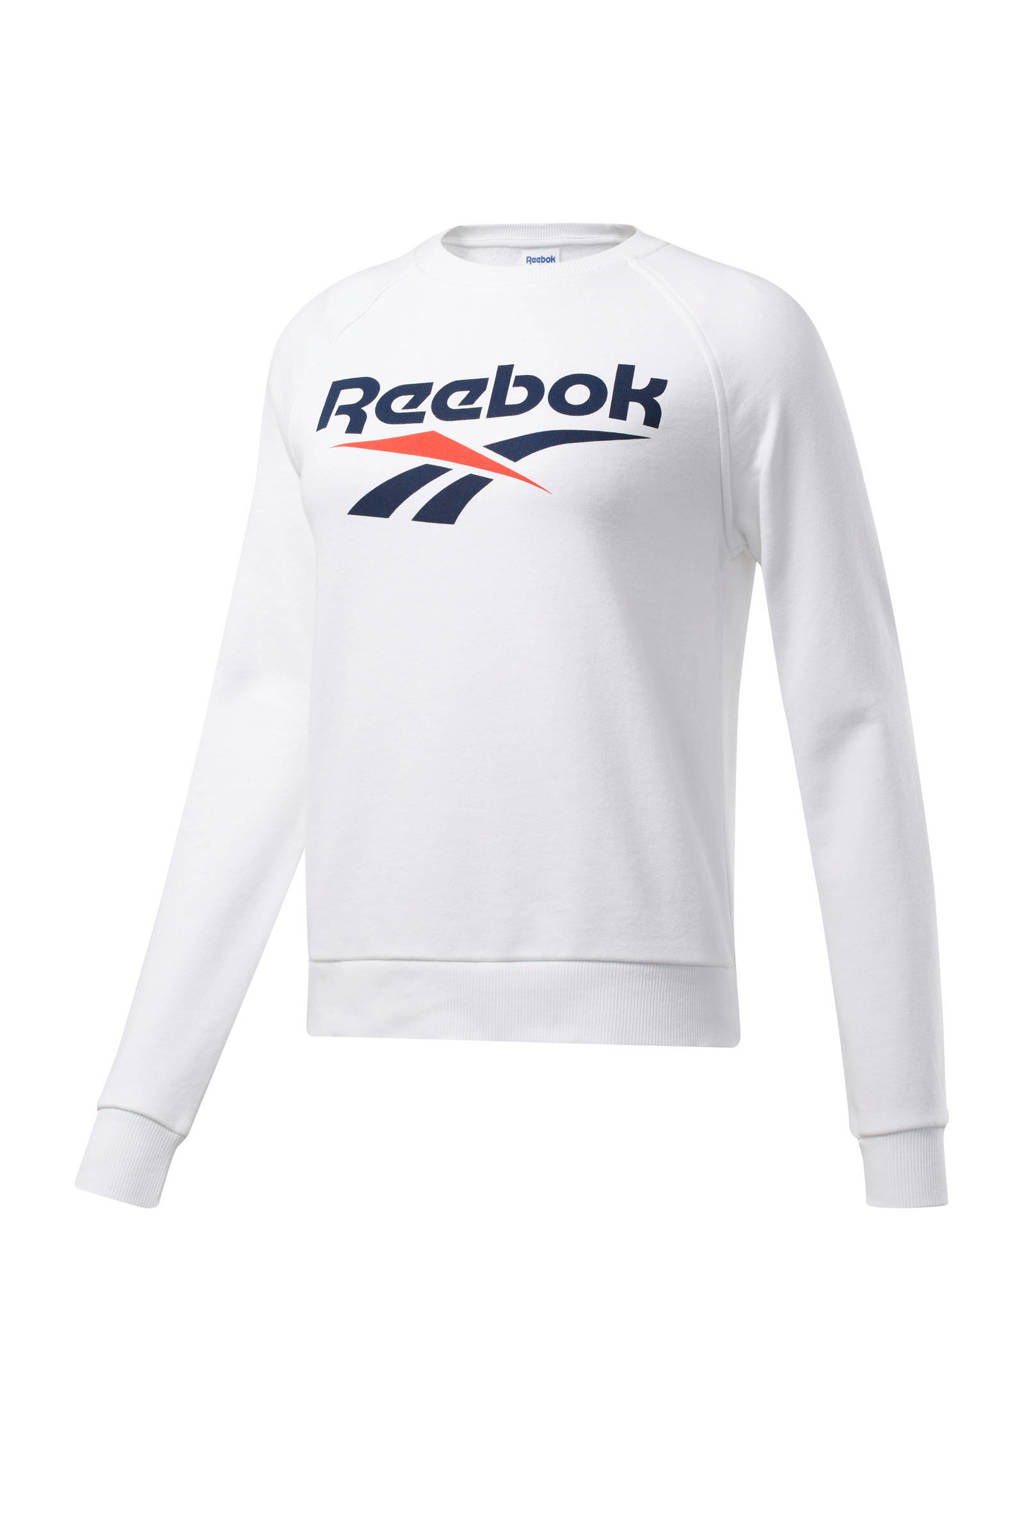 Reebok Classics sweater wit, Wit, Dames